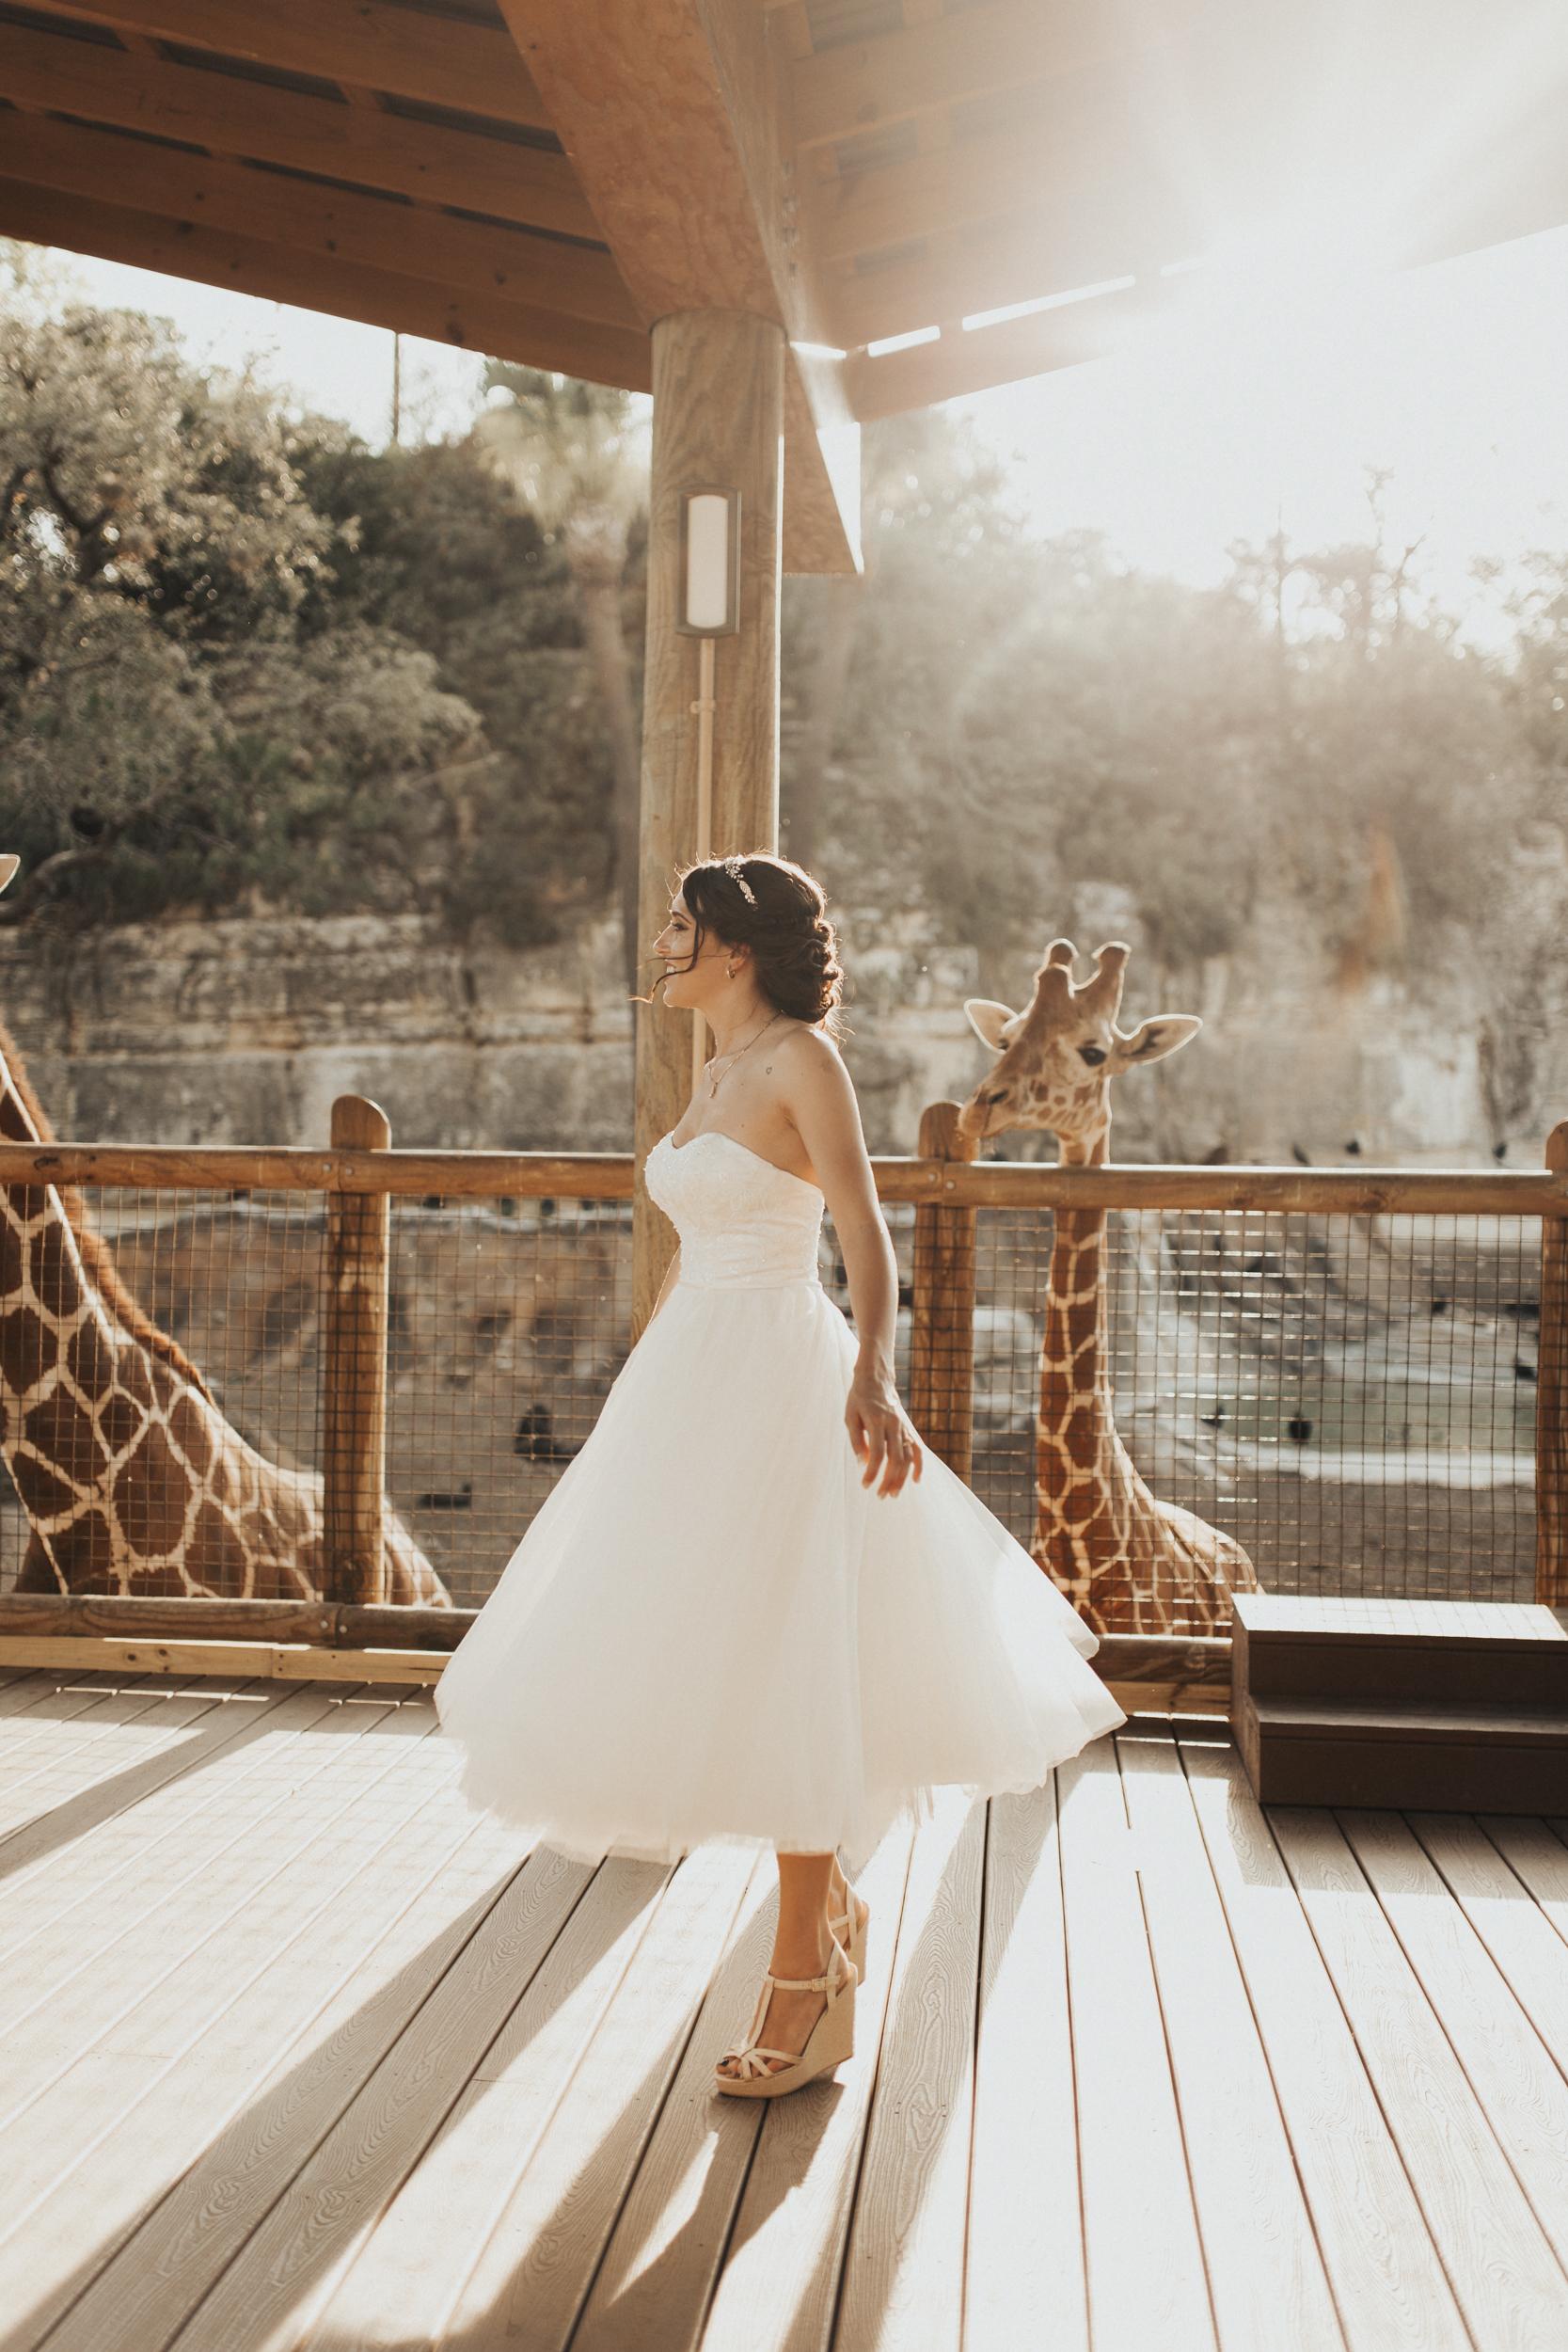 L'Cee_Bridal-28.jpg